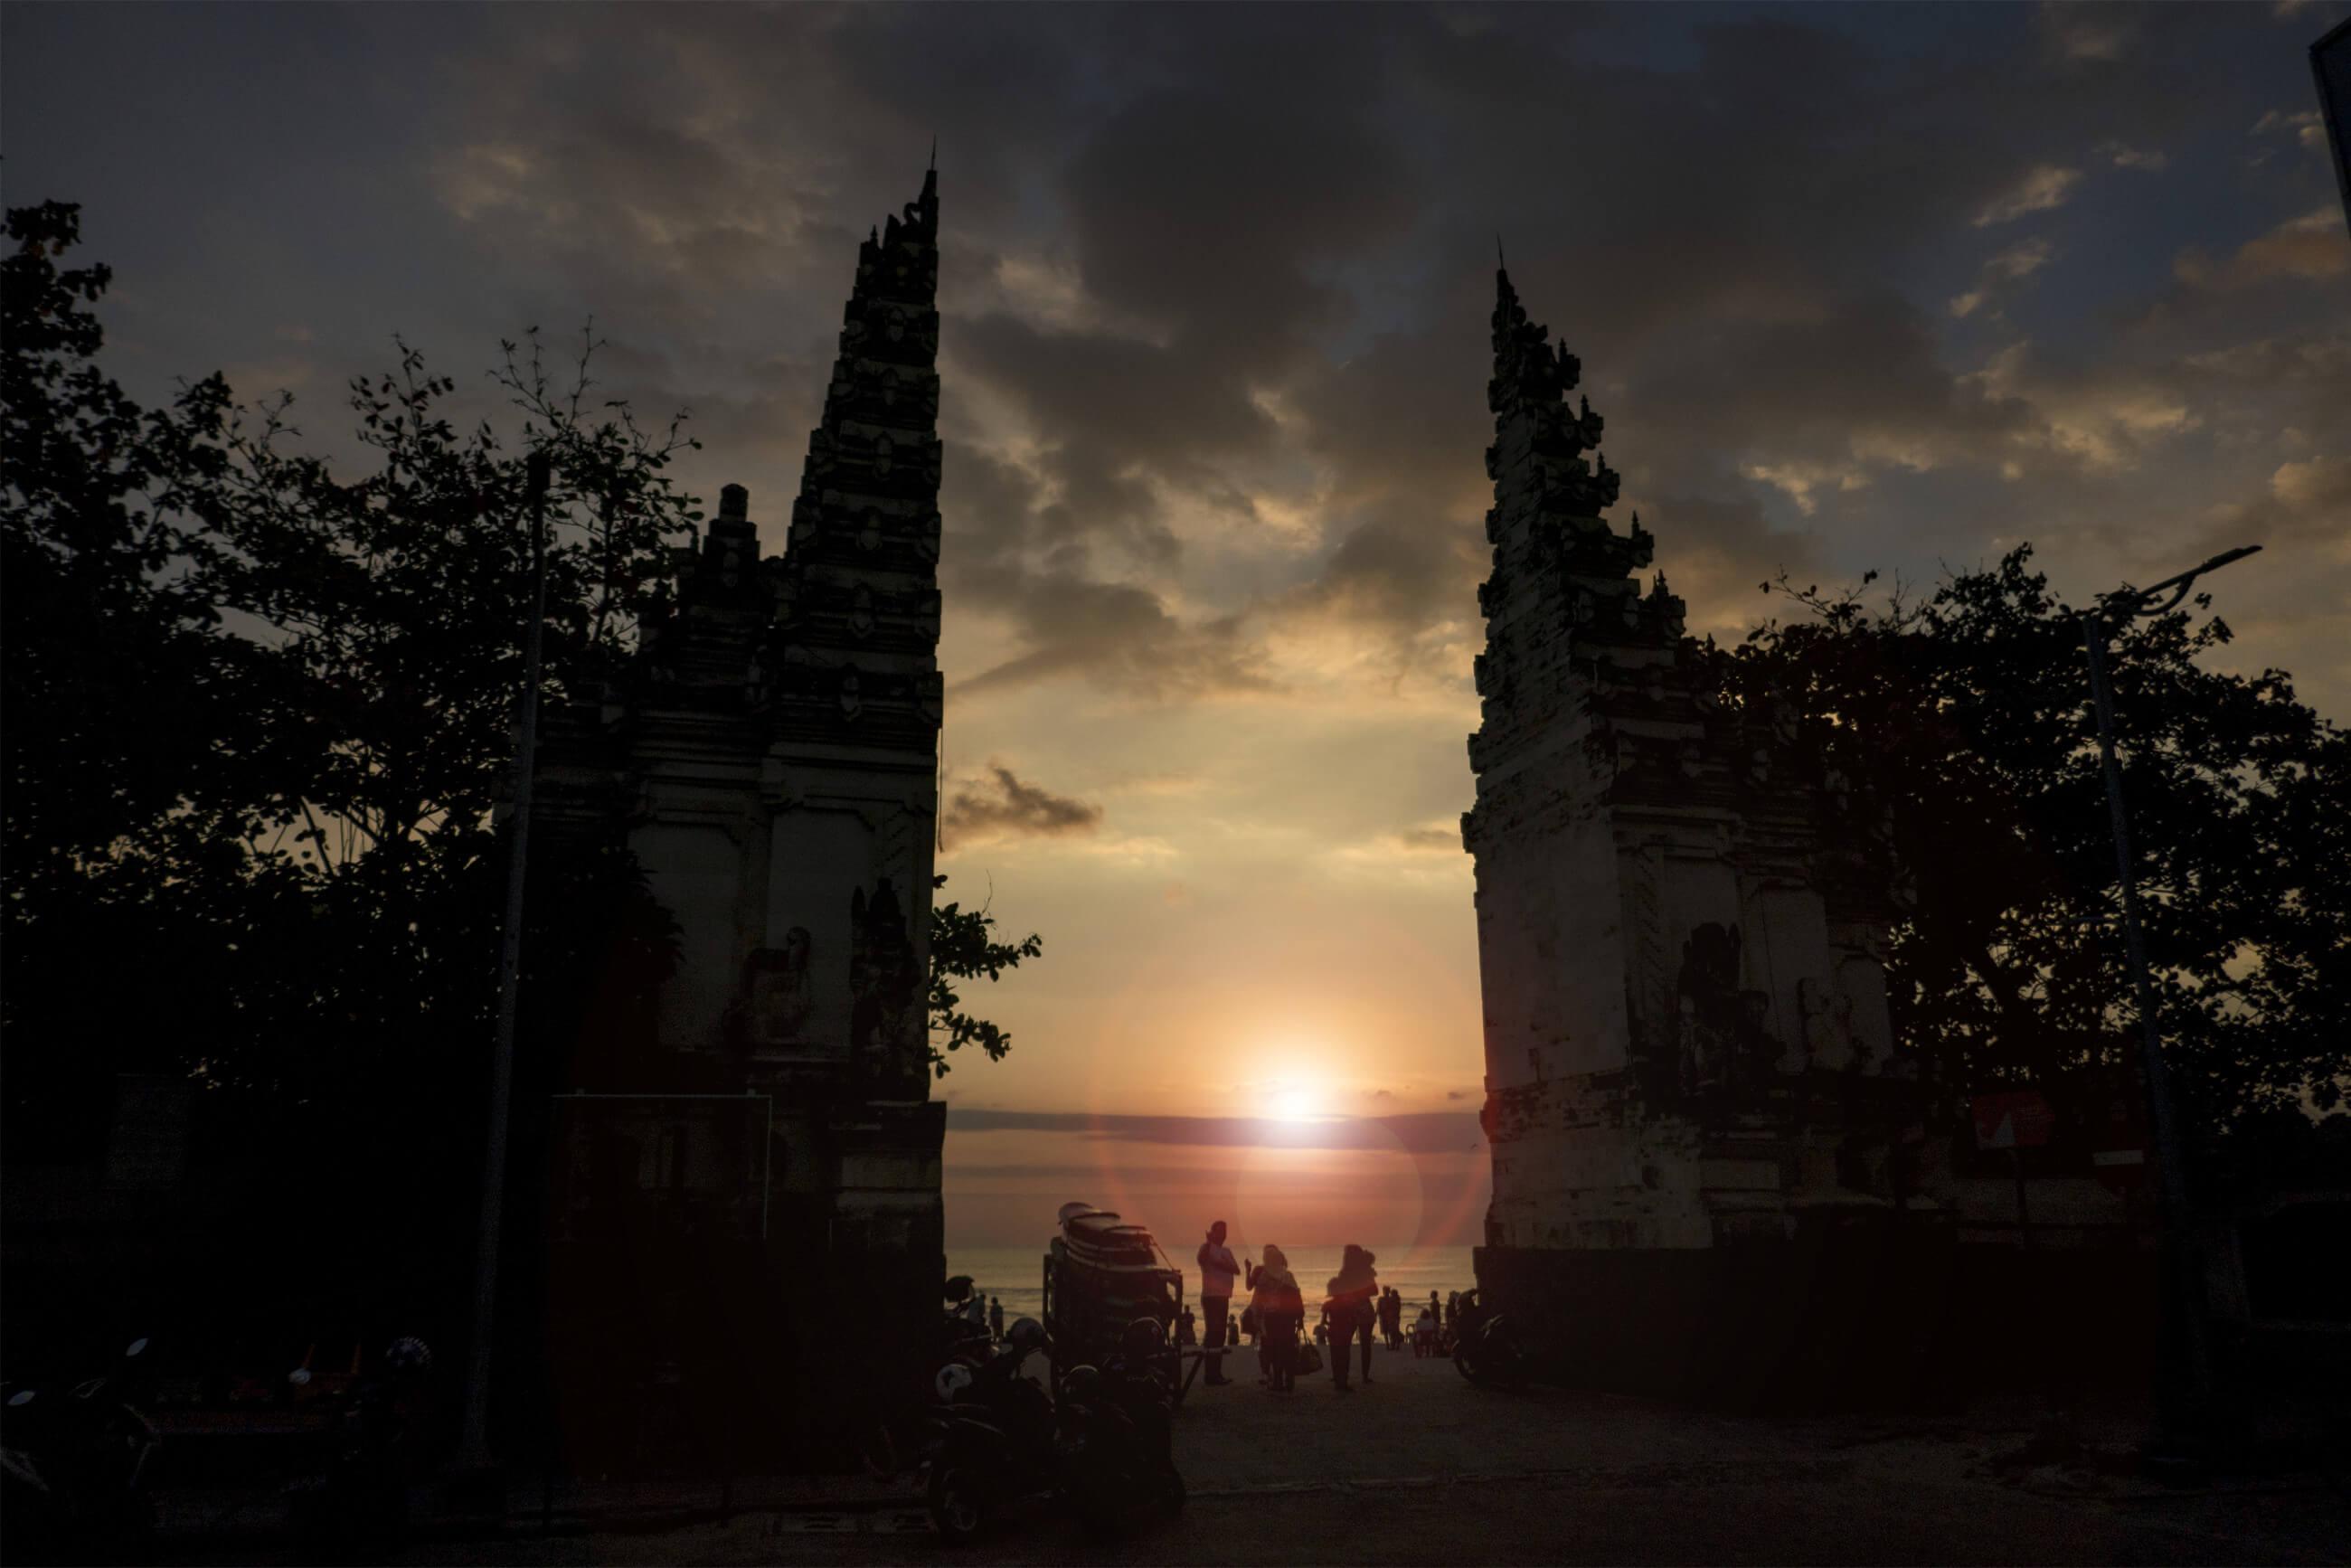 https://bubo.sk/uploads/galleries/7466/martinsimko_indonezia_klf_p1050582-flare.jpg